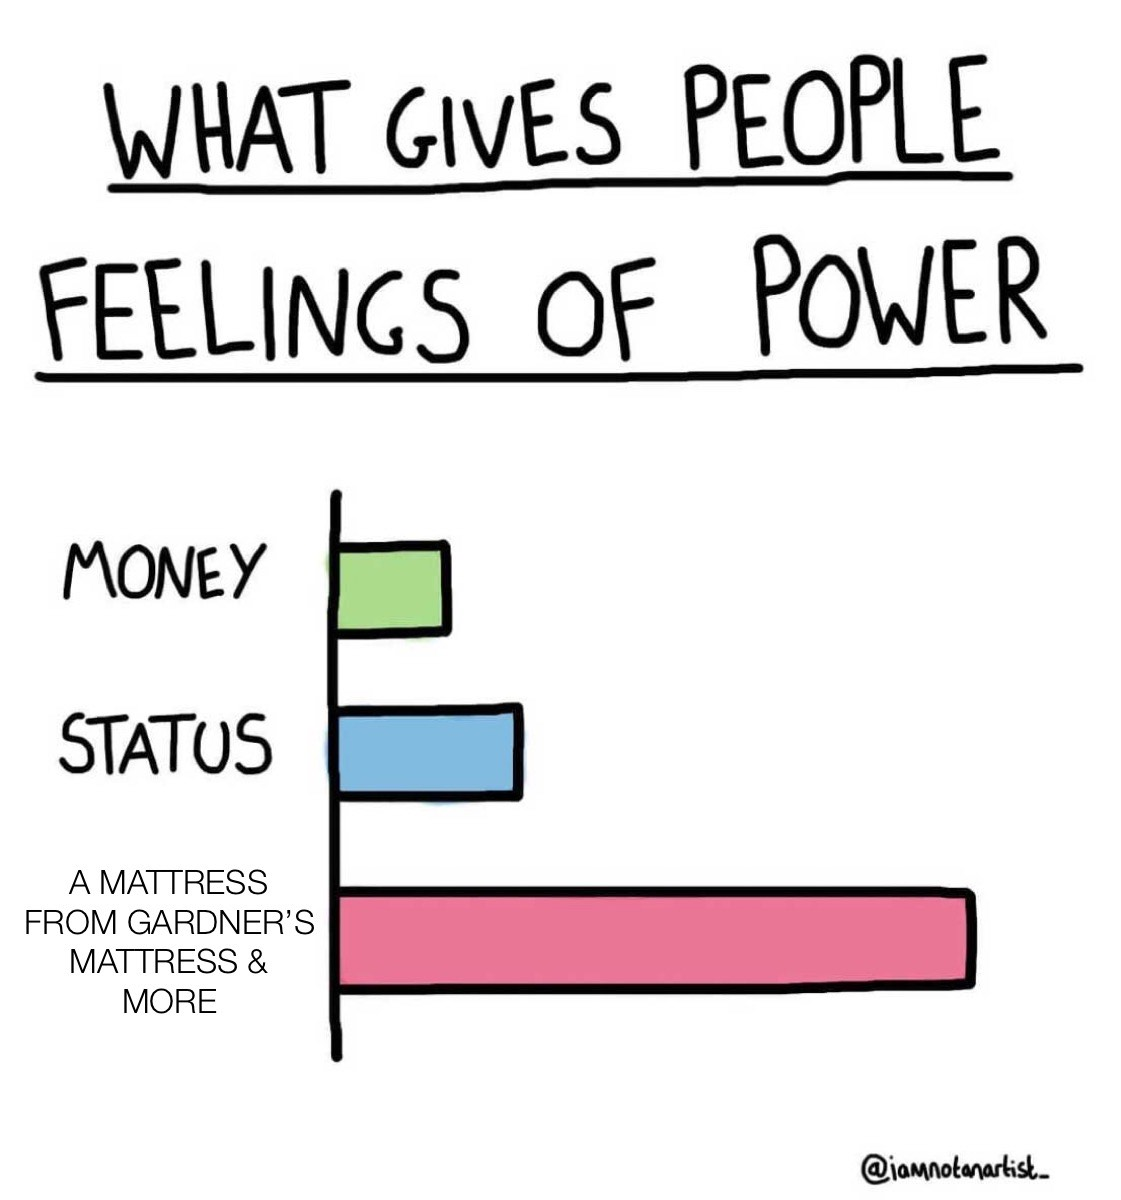 money, status, and a gardner's mattress equal power